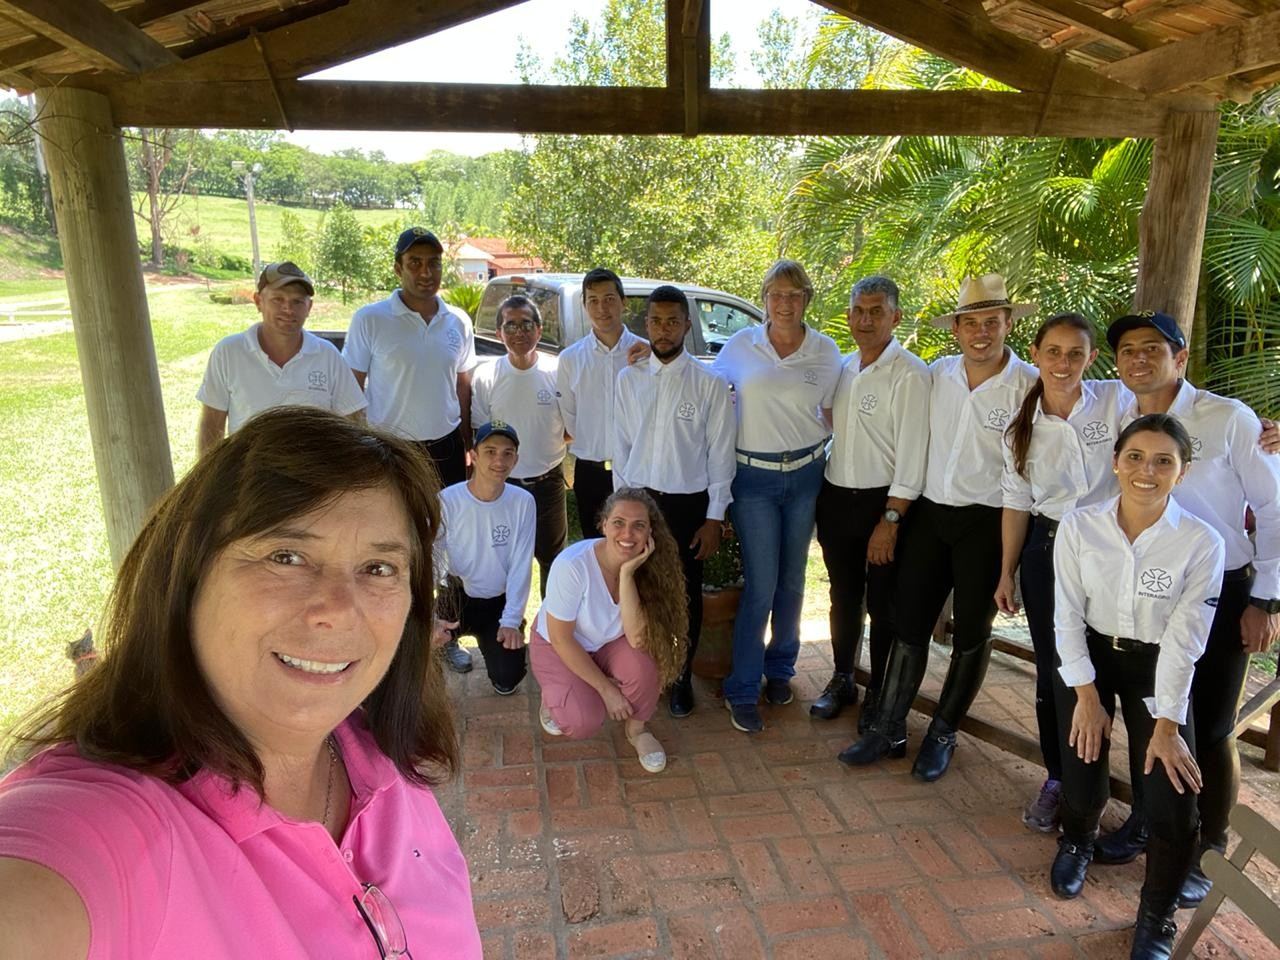 2nd phase of 2020 Interagro Dressage Ranking Photo: Ms. Claudia Mesquita